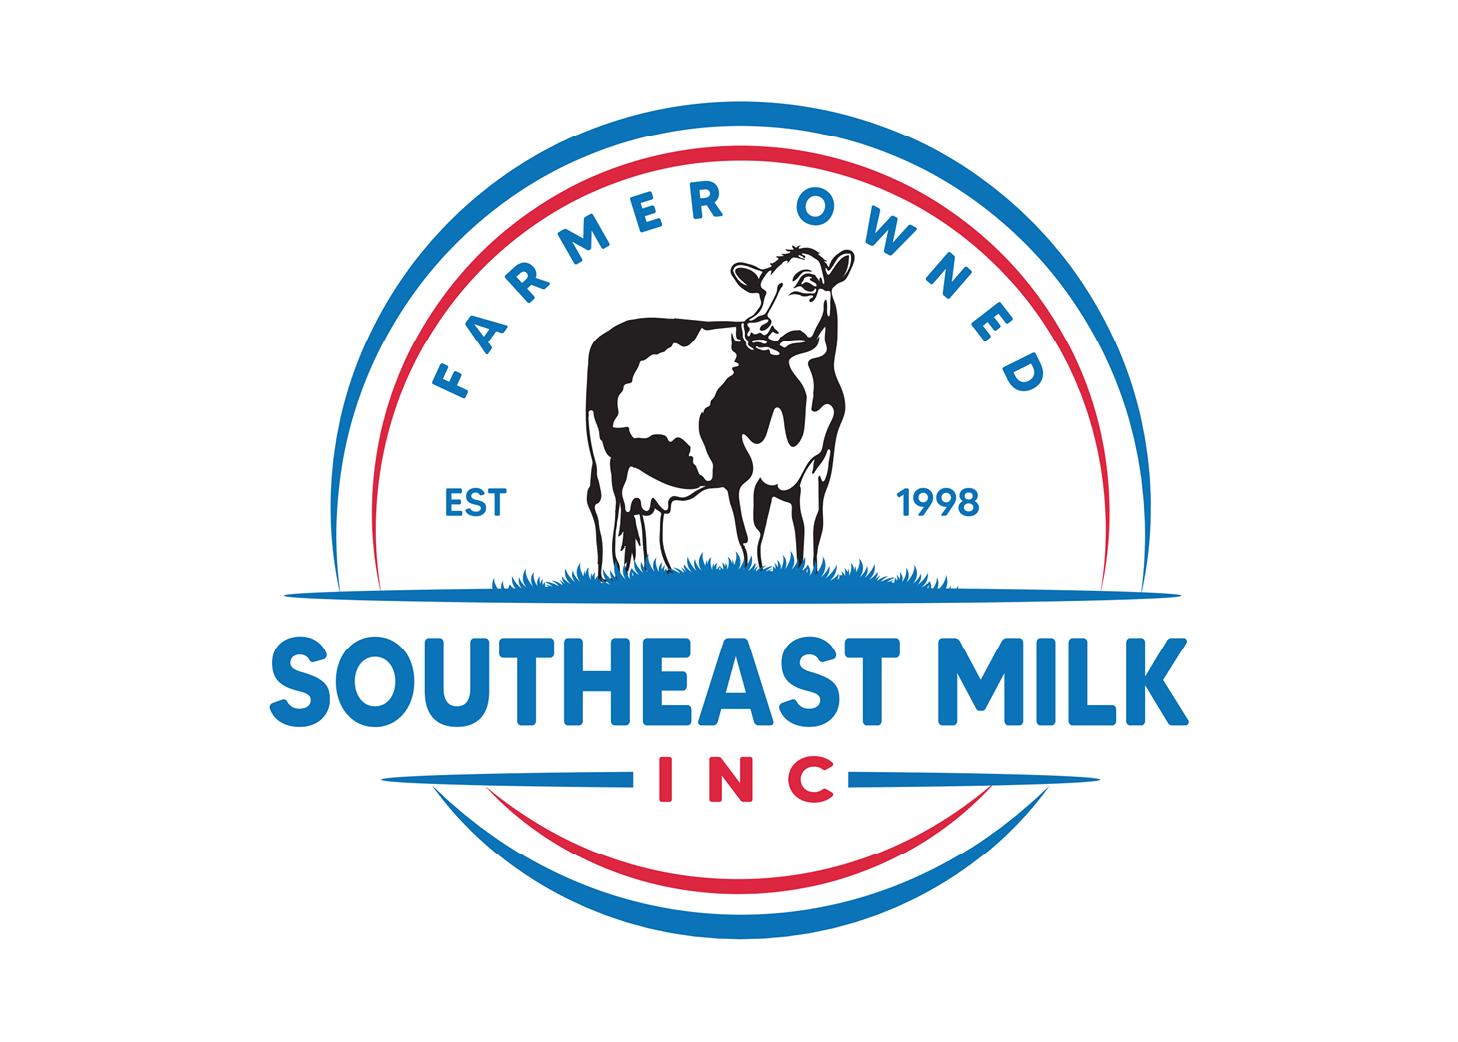 Southeast Milk, Inc., Belleview, Florida